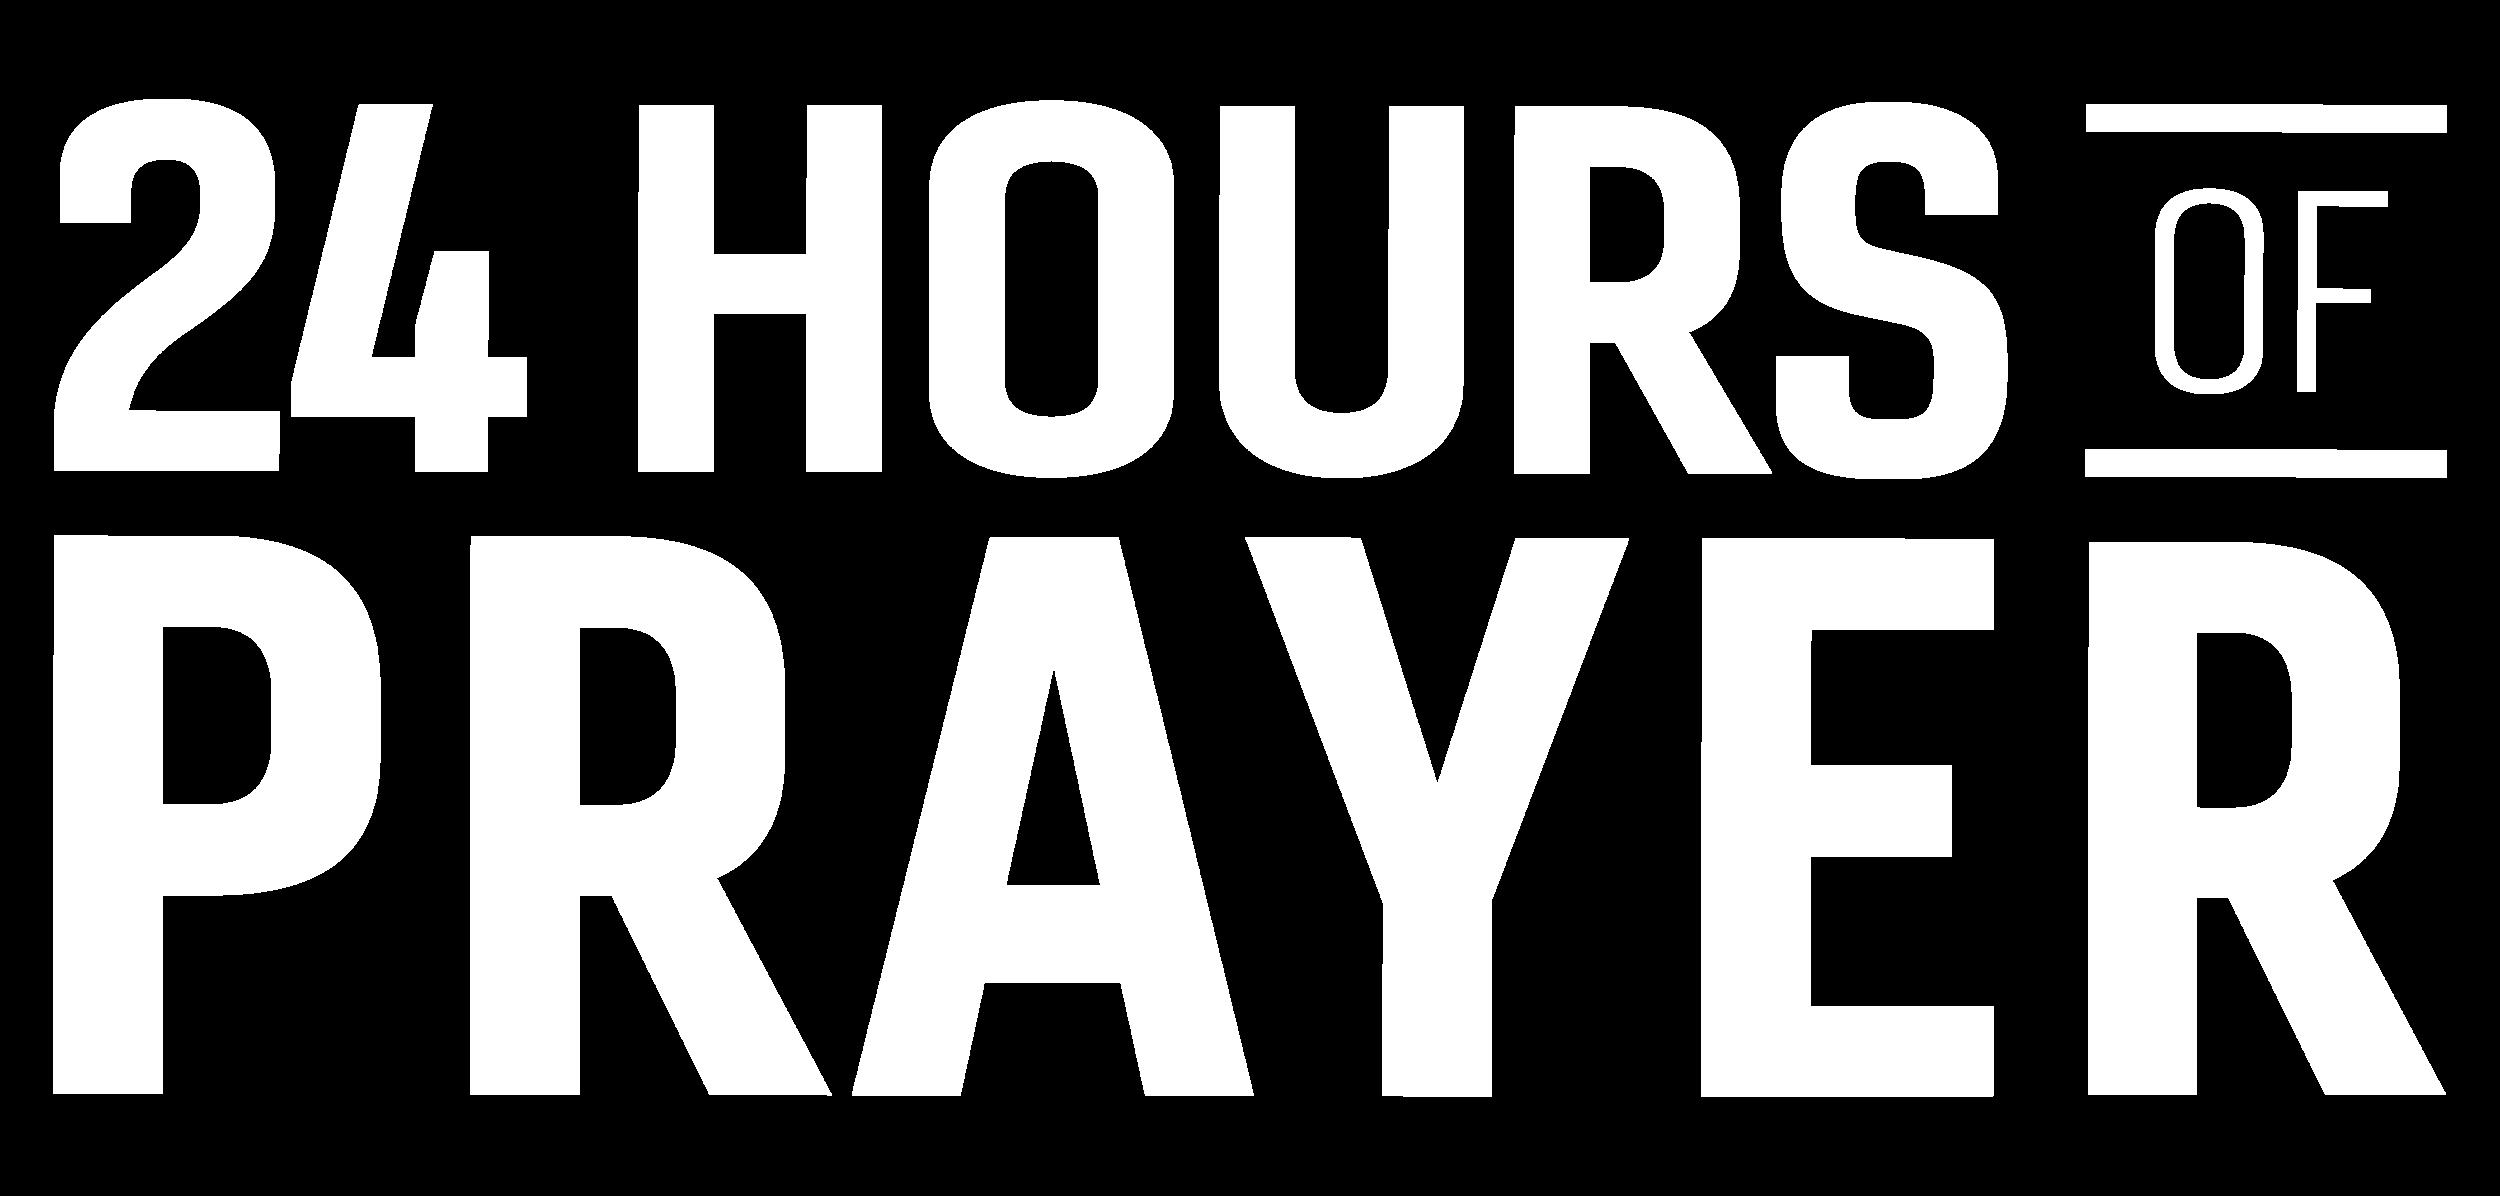 24 Hours of Prayer_Digital Graphics_LOGO.png